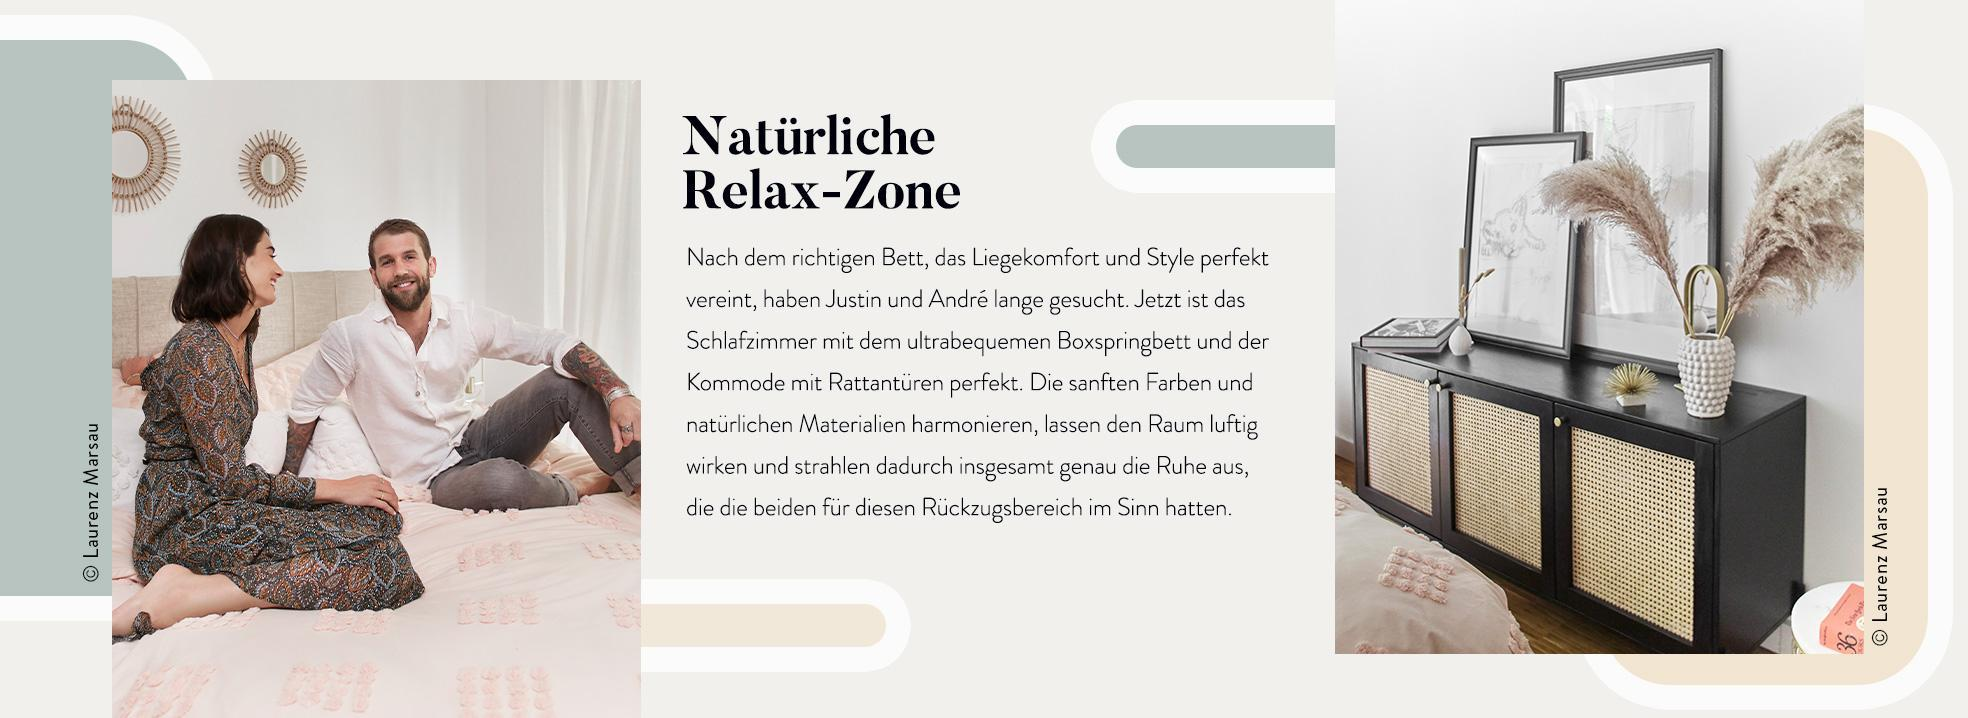 André Hamann Schlafzimmer Bilder Bett Sideboard